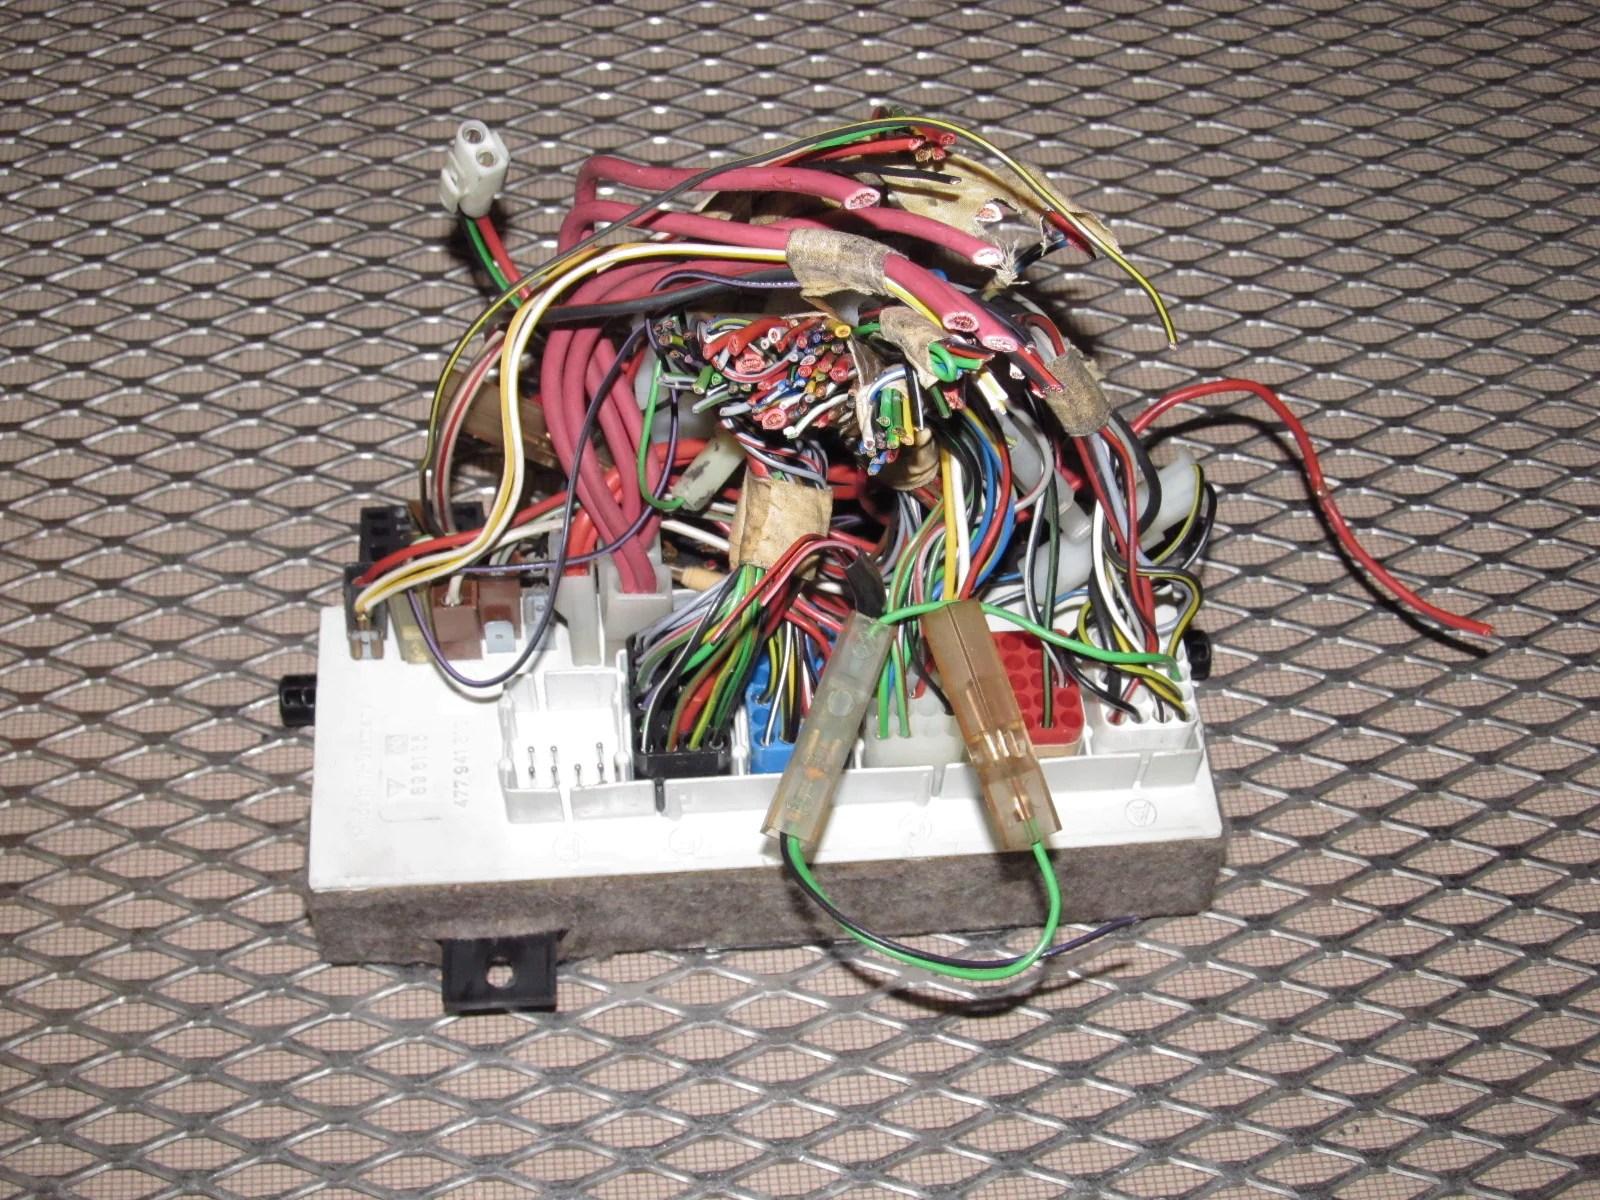 hight resolution of 83 porsche 944 fuse box wiring diagram read 83 porsche 944 fuse box